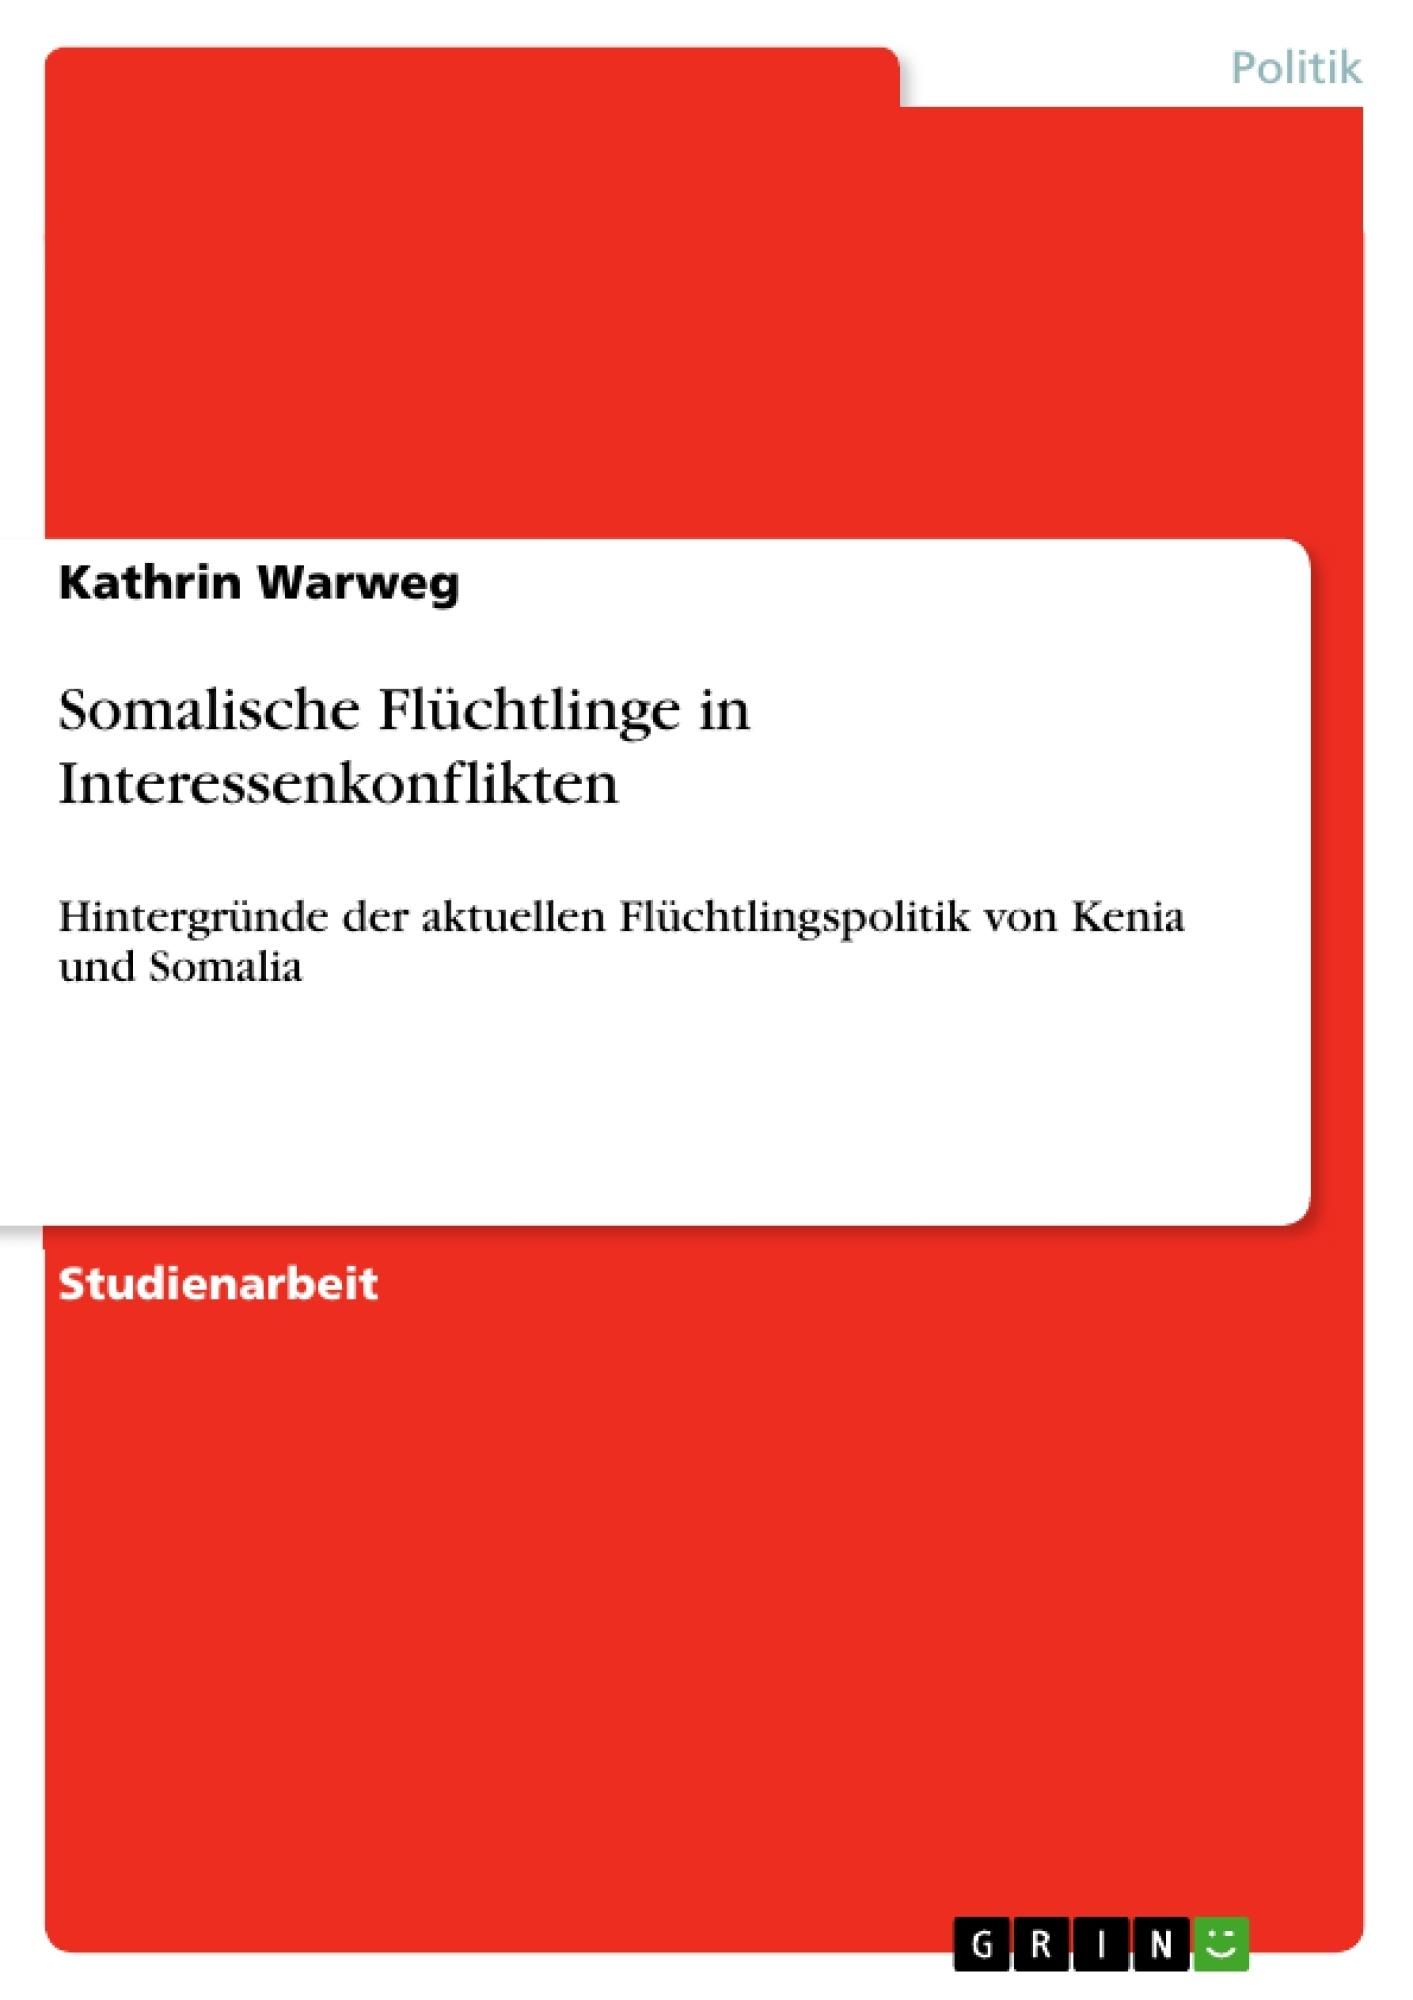 Titel: Somalische Flüchtlinge in Interessenkonflikten